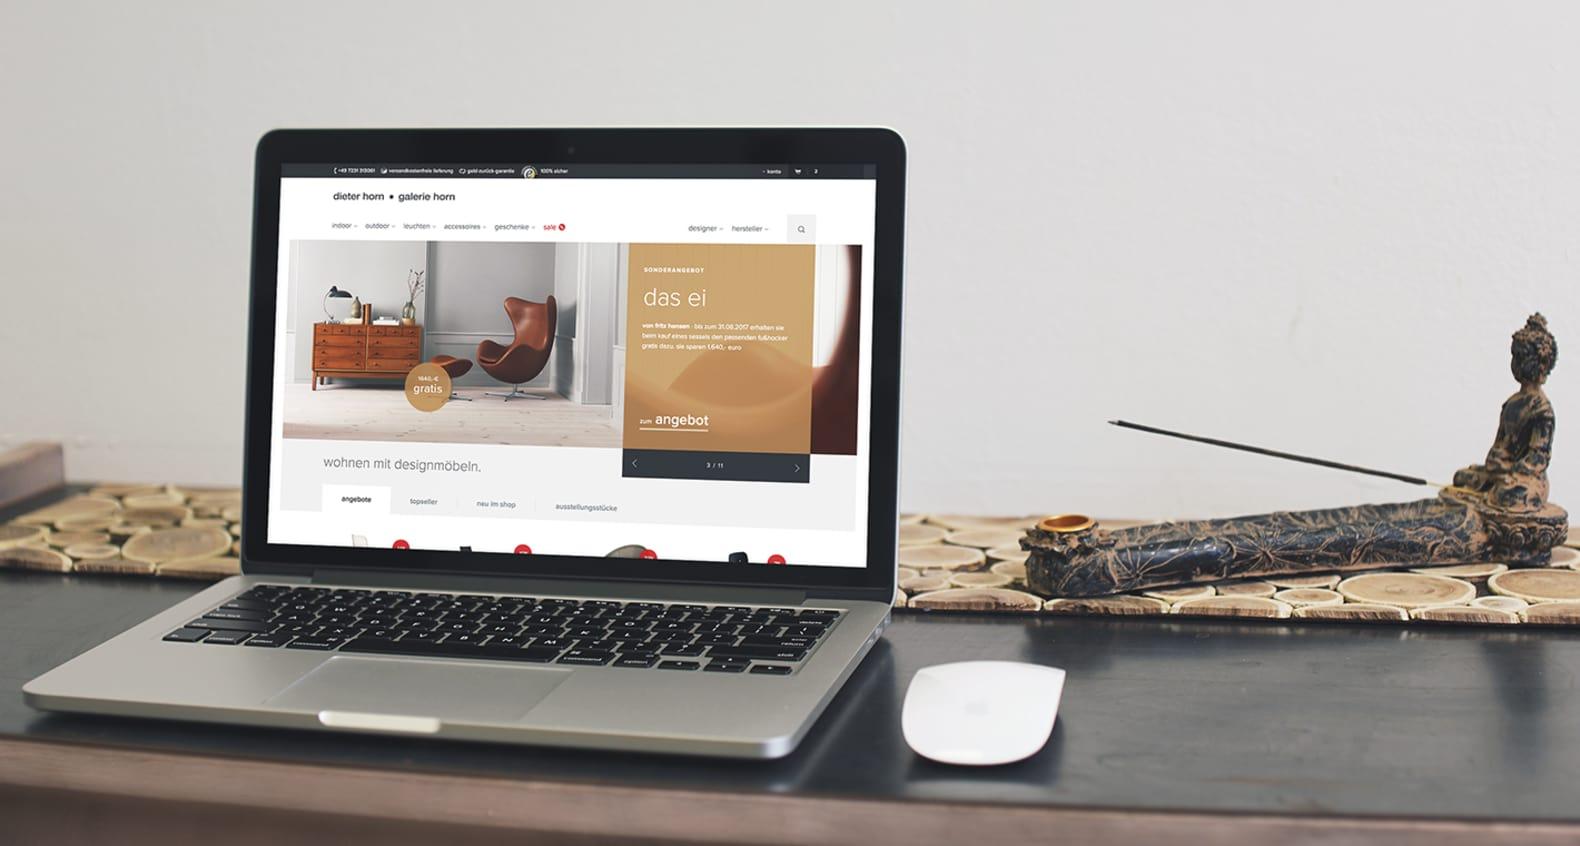 Macbook mit geöffneter Website dieter-horn.de – Designermöbel online kaufen. Im Shop dieter-horn.de